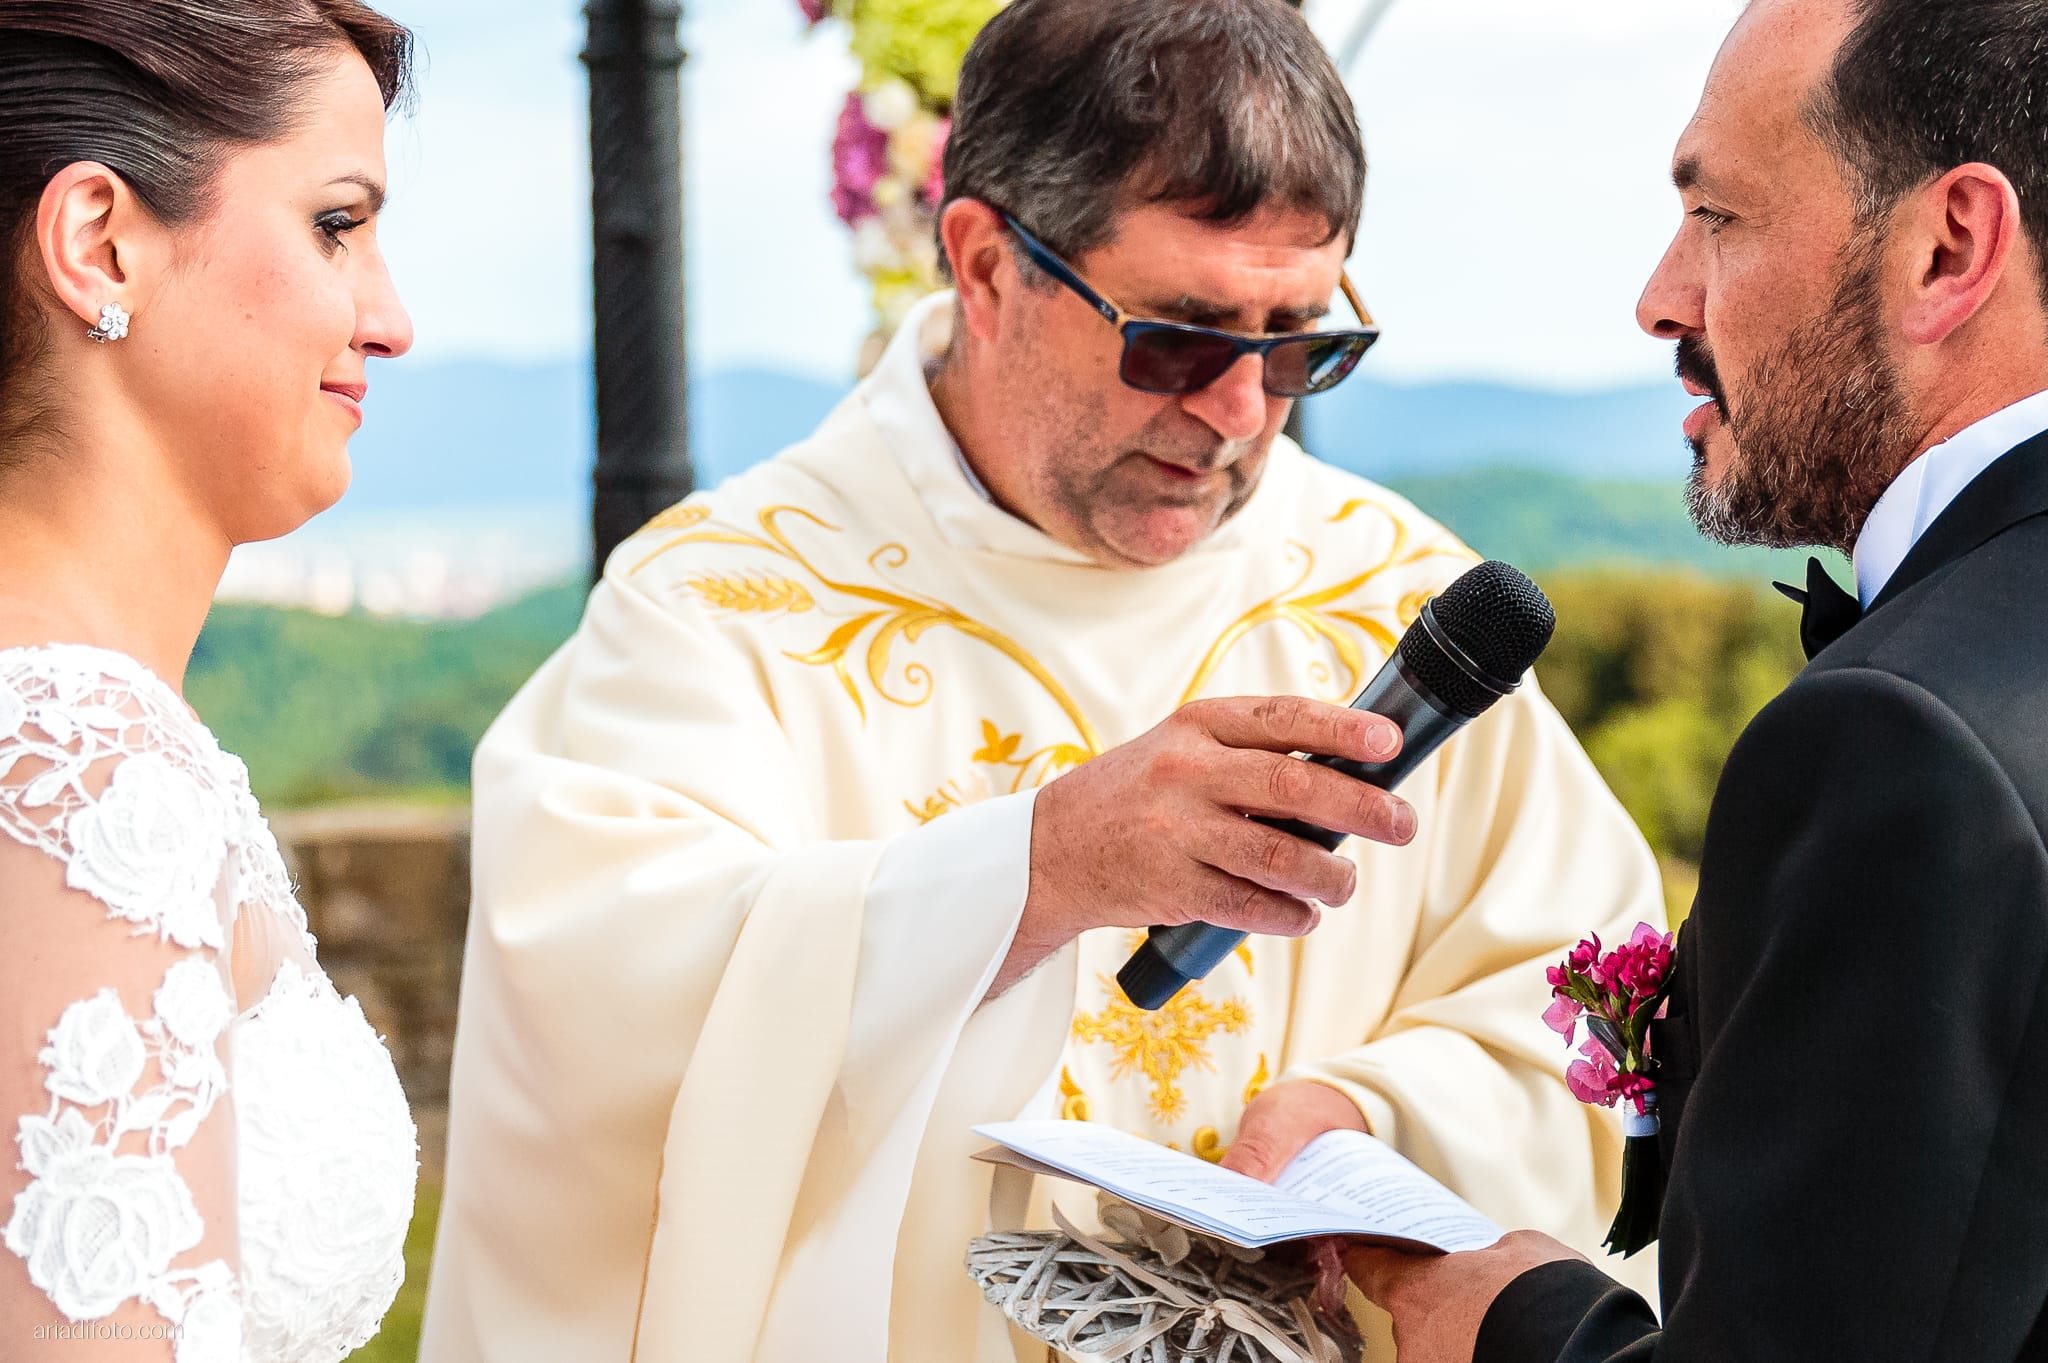 Sofia Mario Matrimonio Baronesse Tacco Collio Gorizia cerimonia promesse